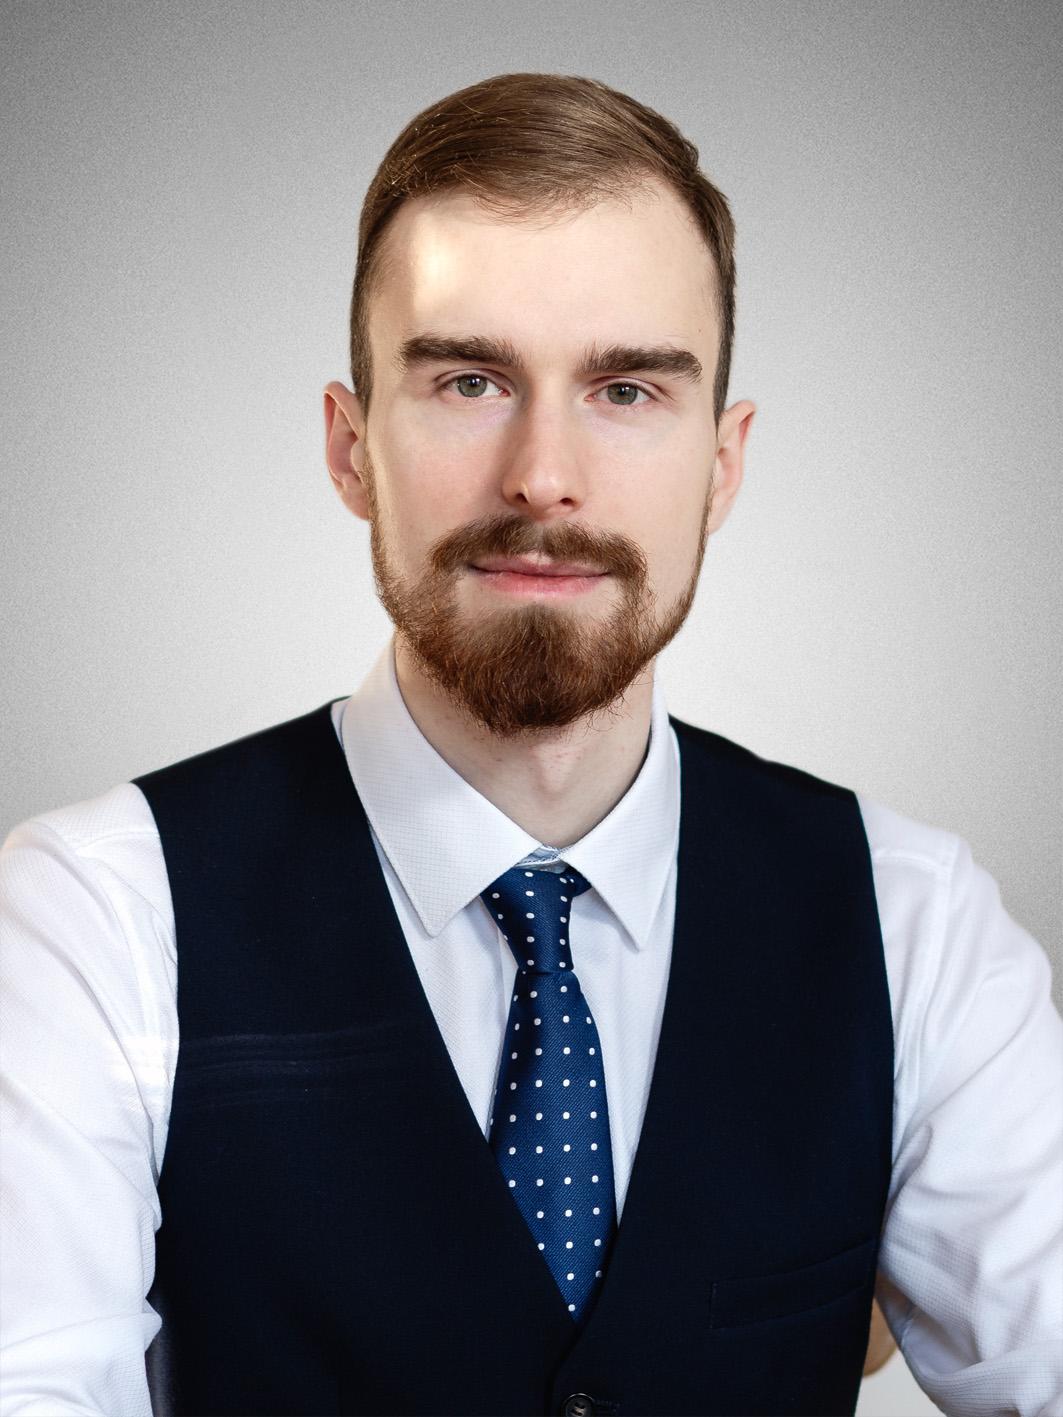 Грудин Фёдор Владимирович